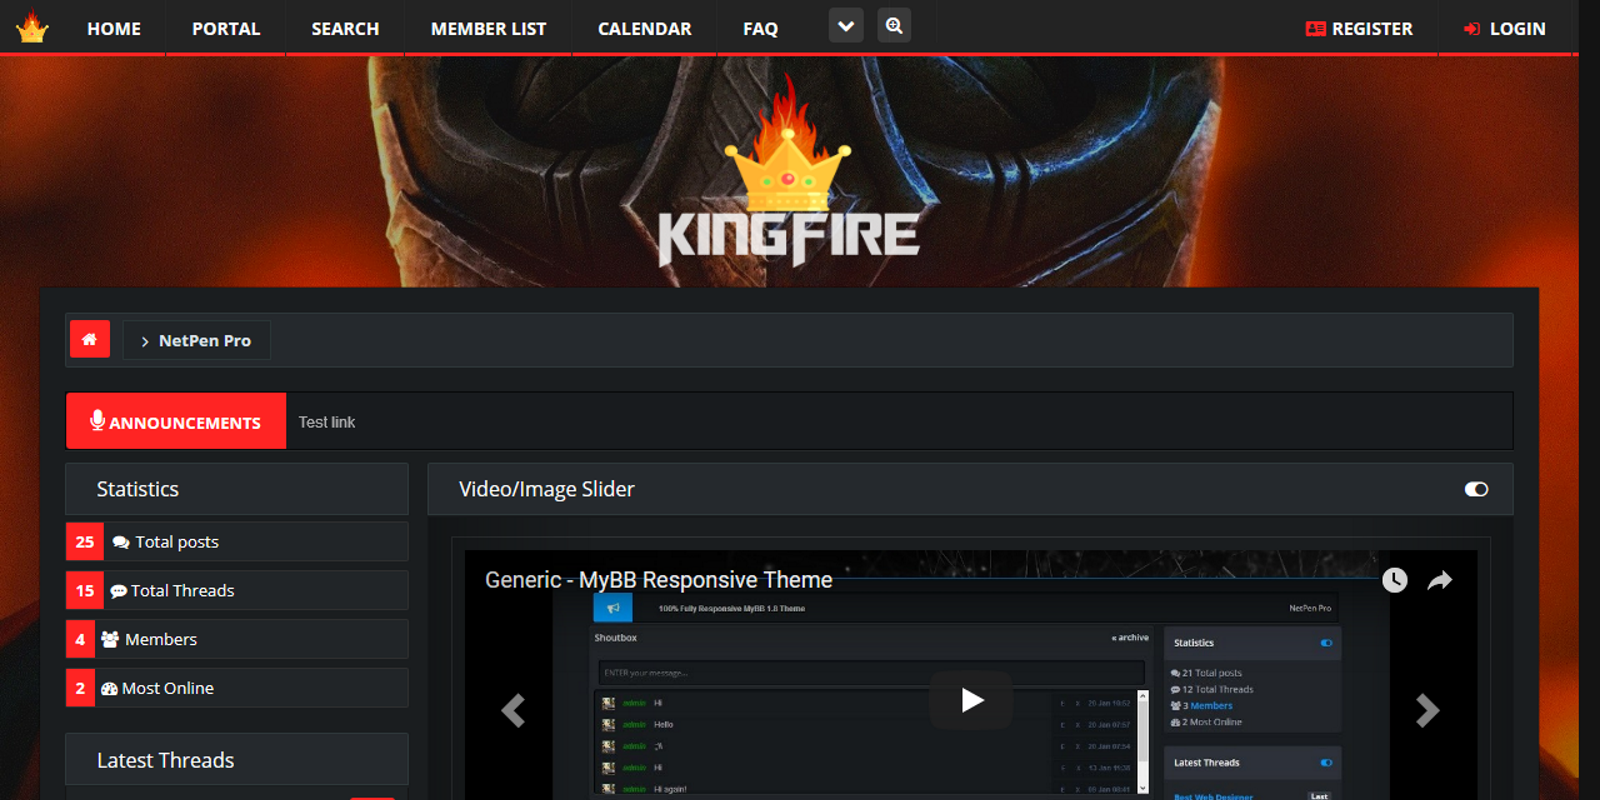 KingFire, Responsive MyBB 1.8 Theme